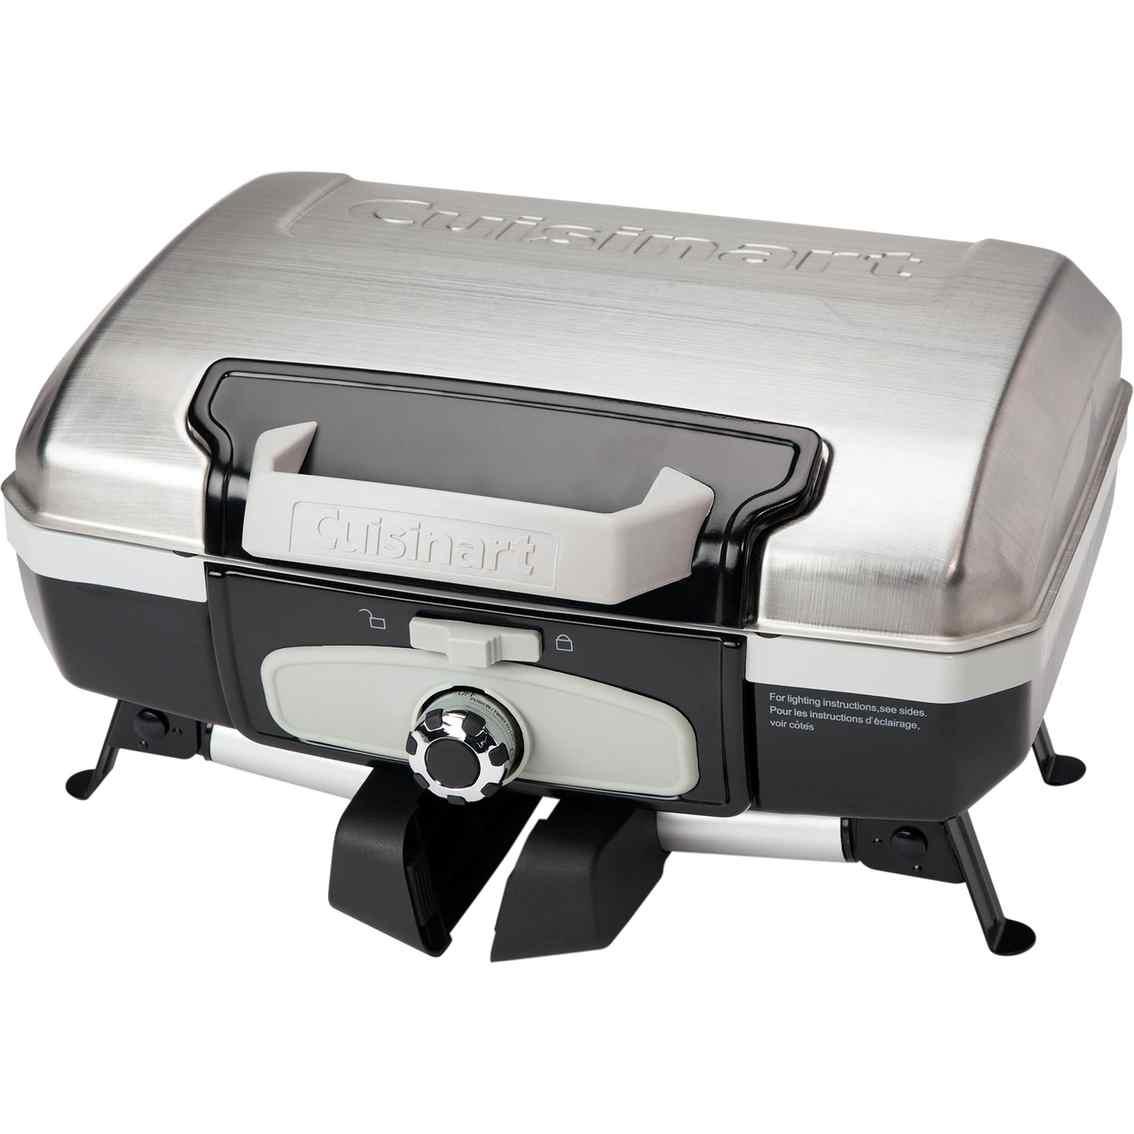 Cuisinart CGG-180TS Charcoal Grill